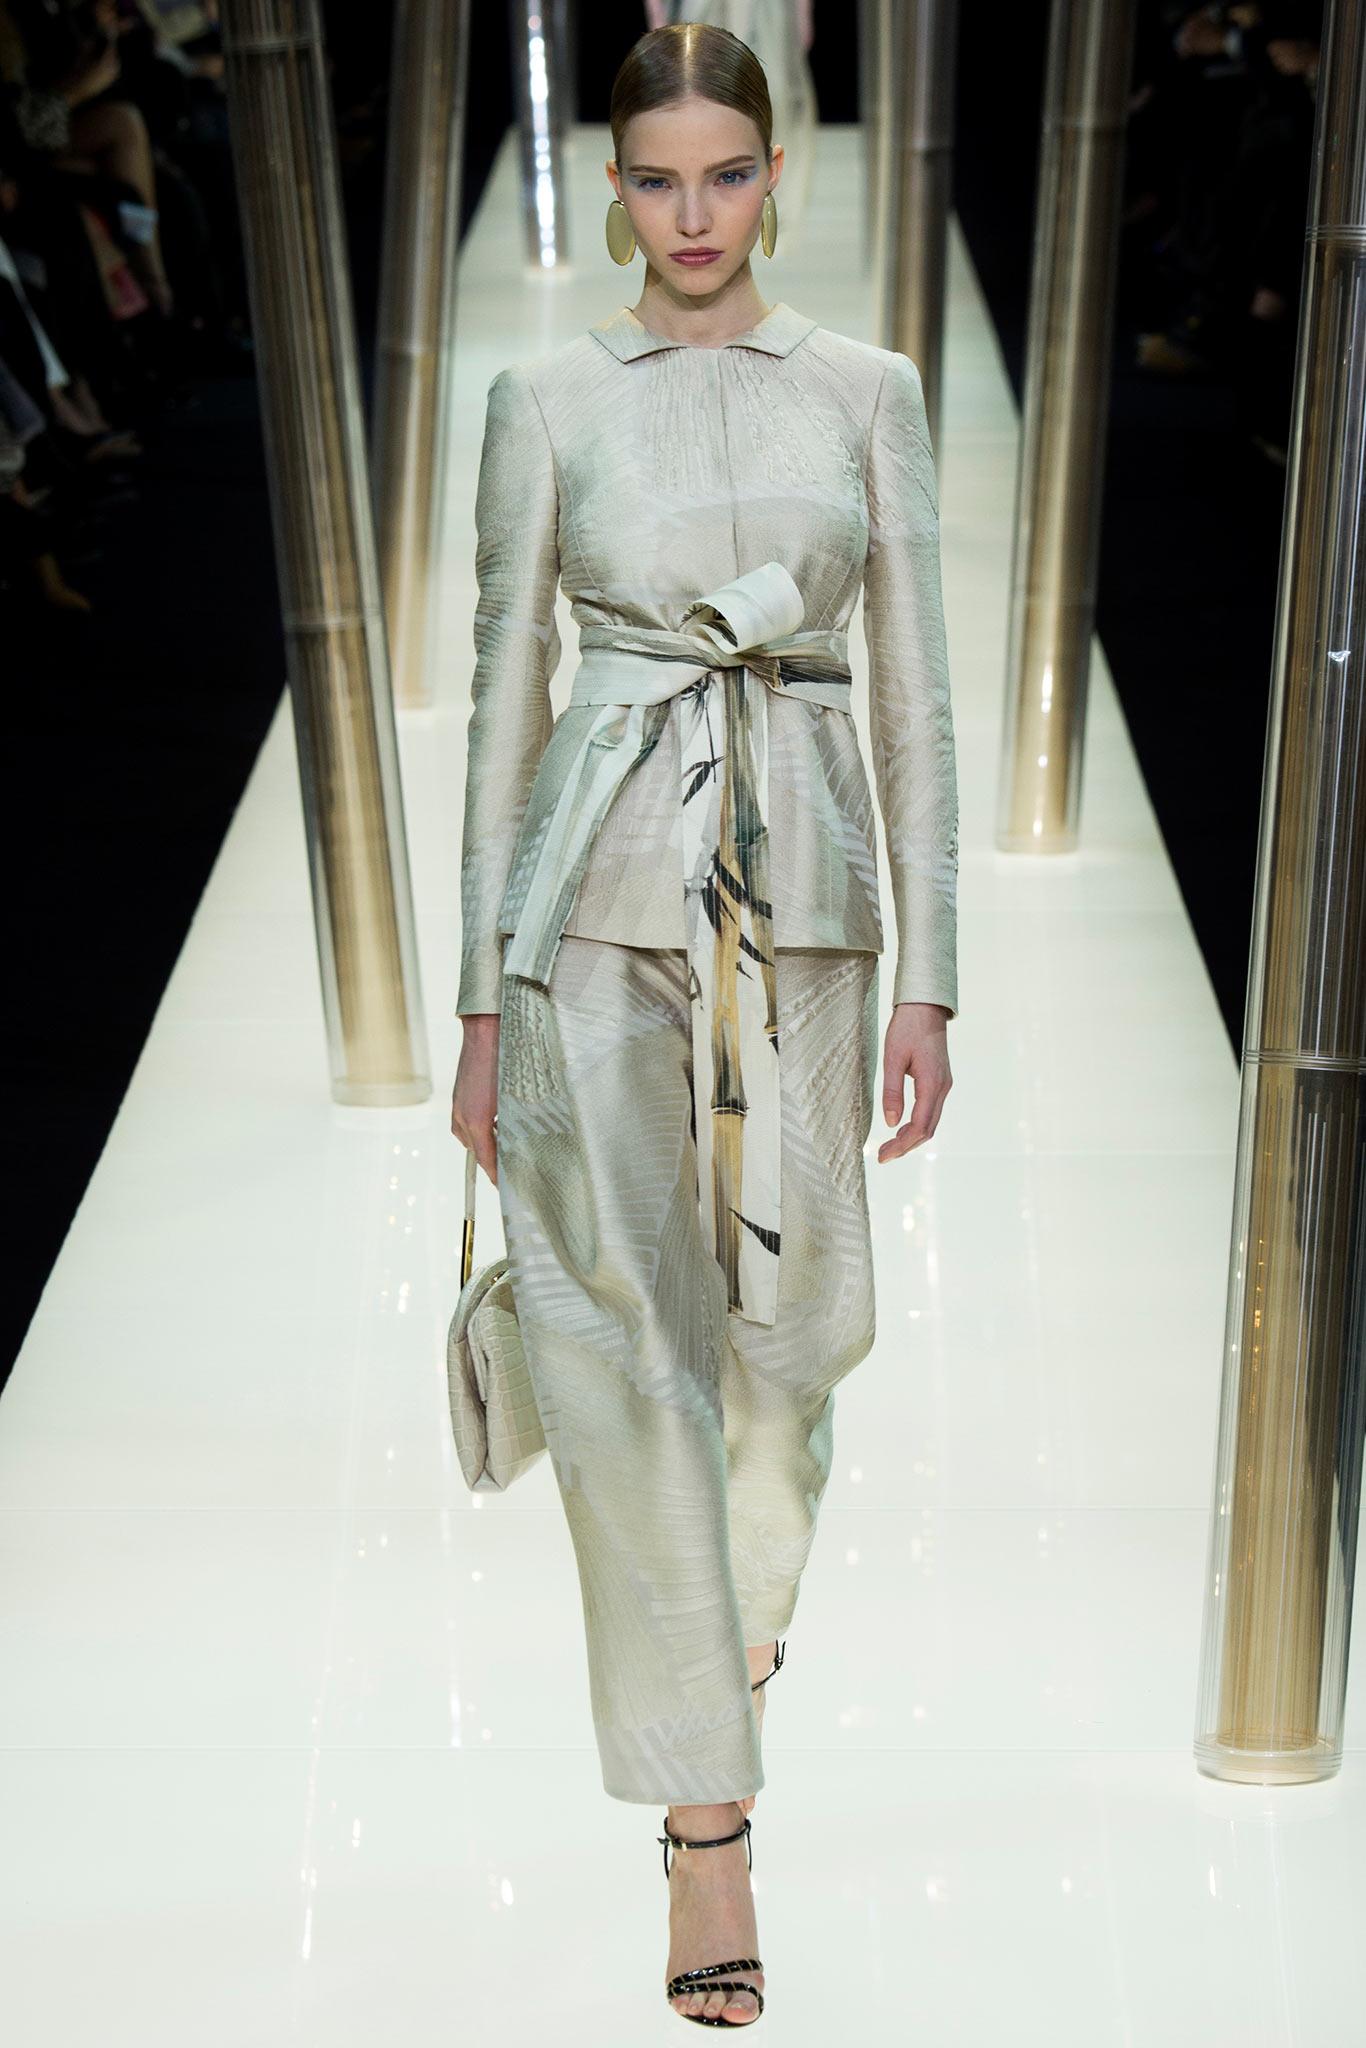 Armani -Privé-Spring -2015- Couture